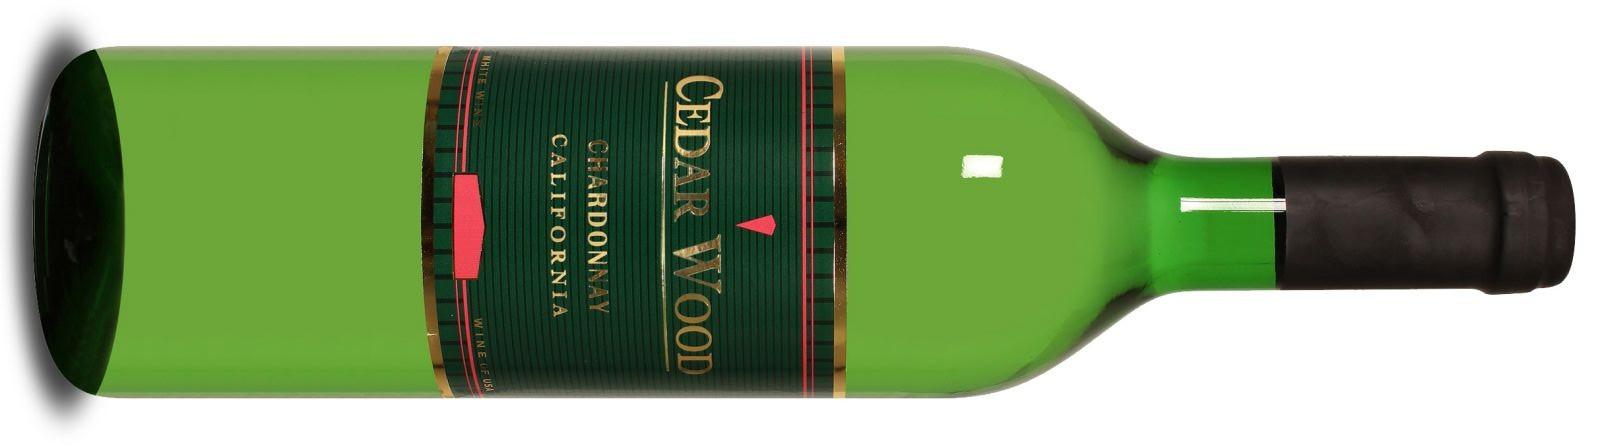 Cedar Wood Chardonnay 2013